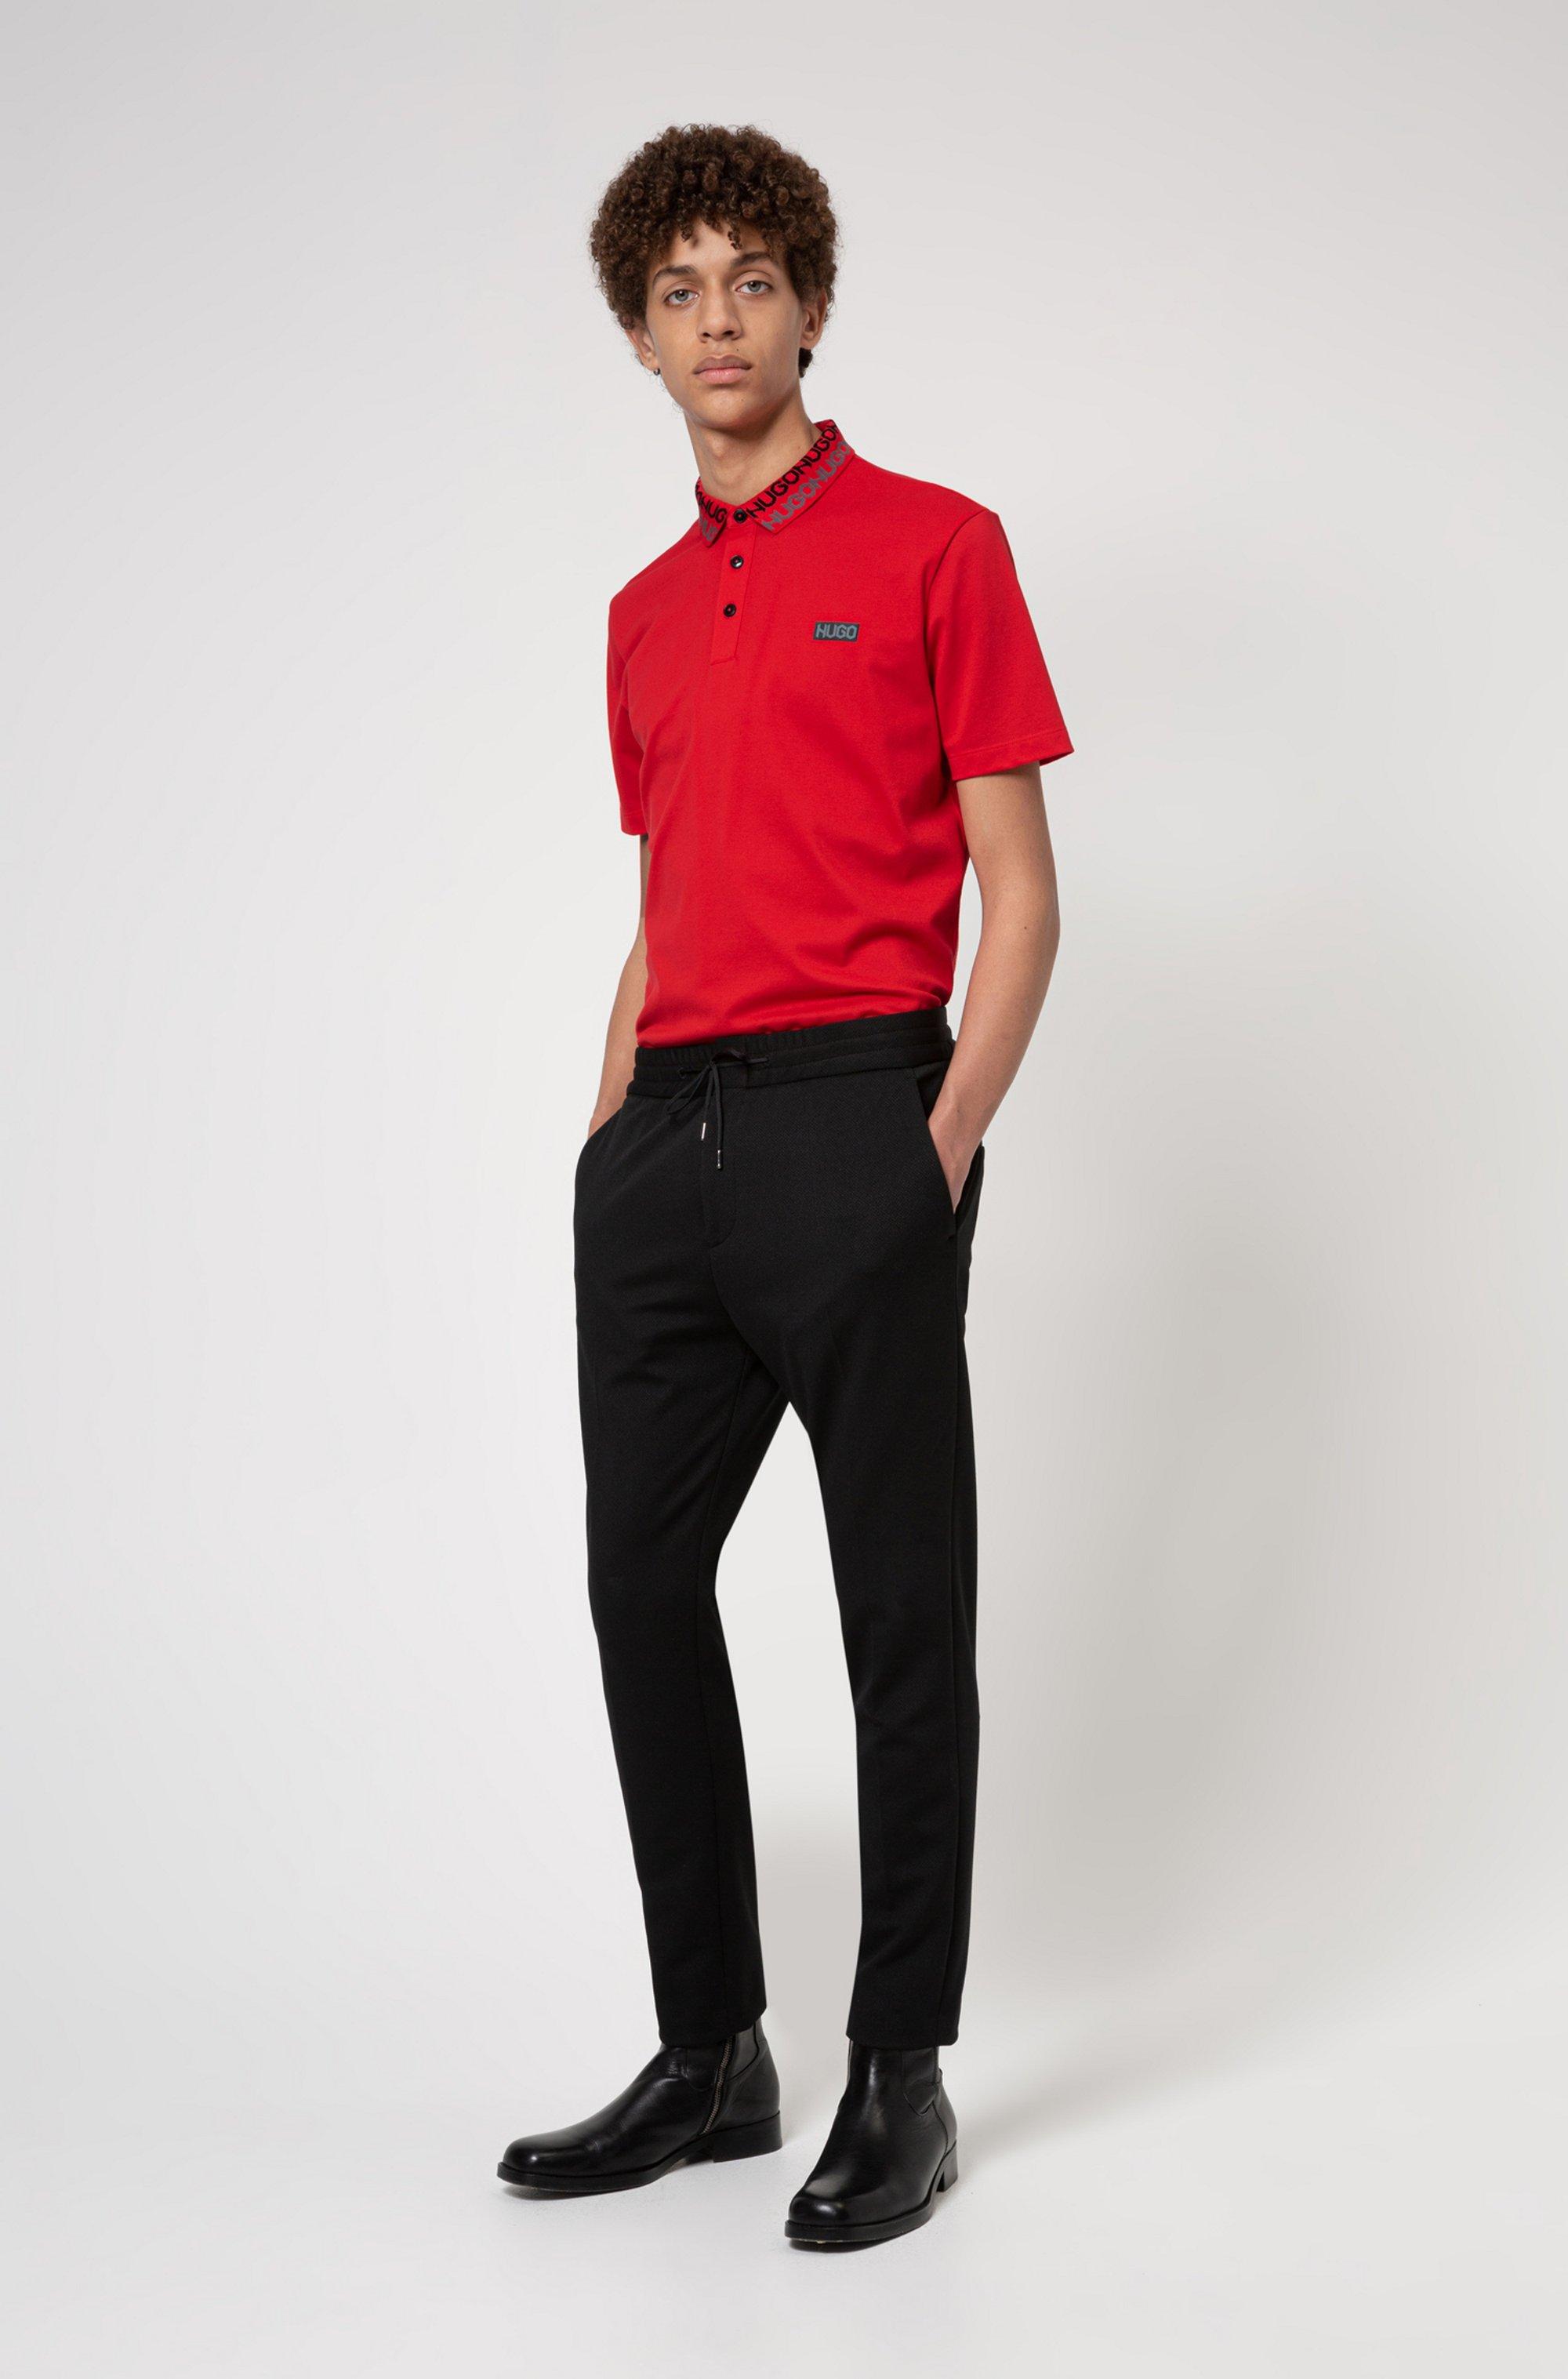 Permafit-cotton polo shirt with tyre-print logos